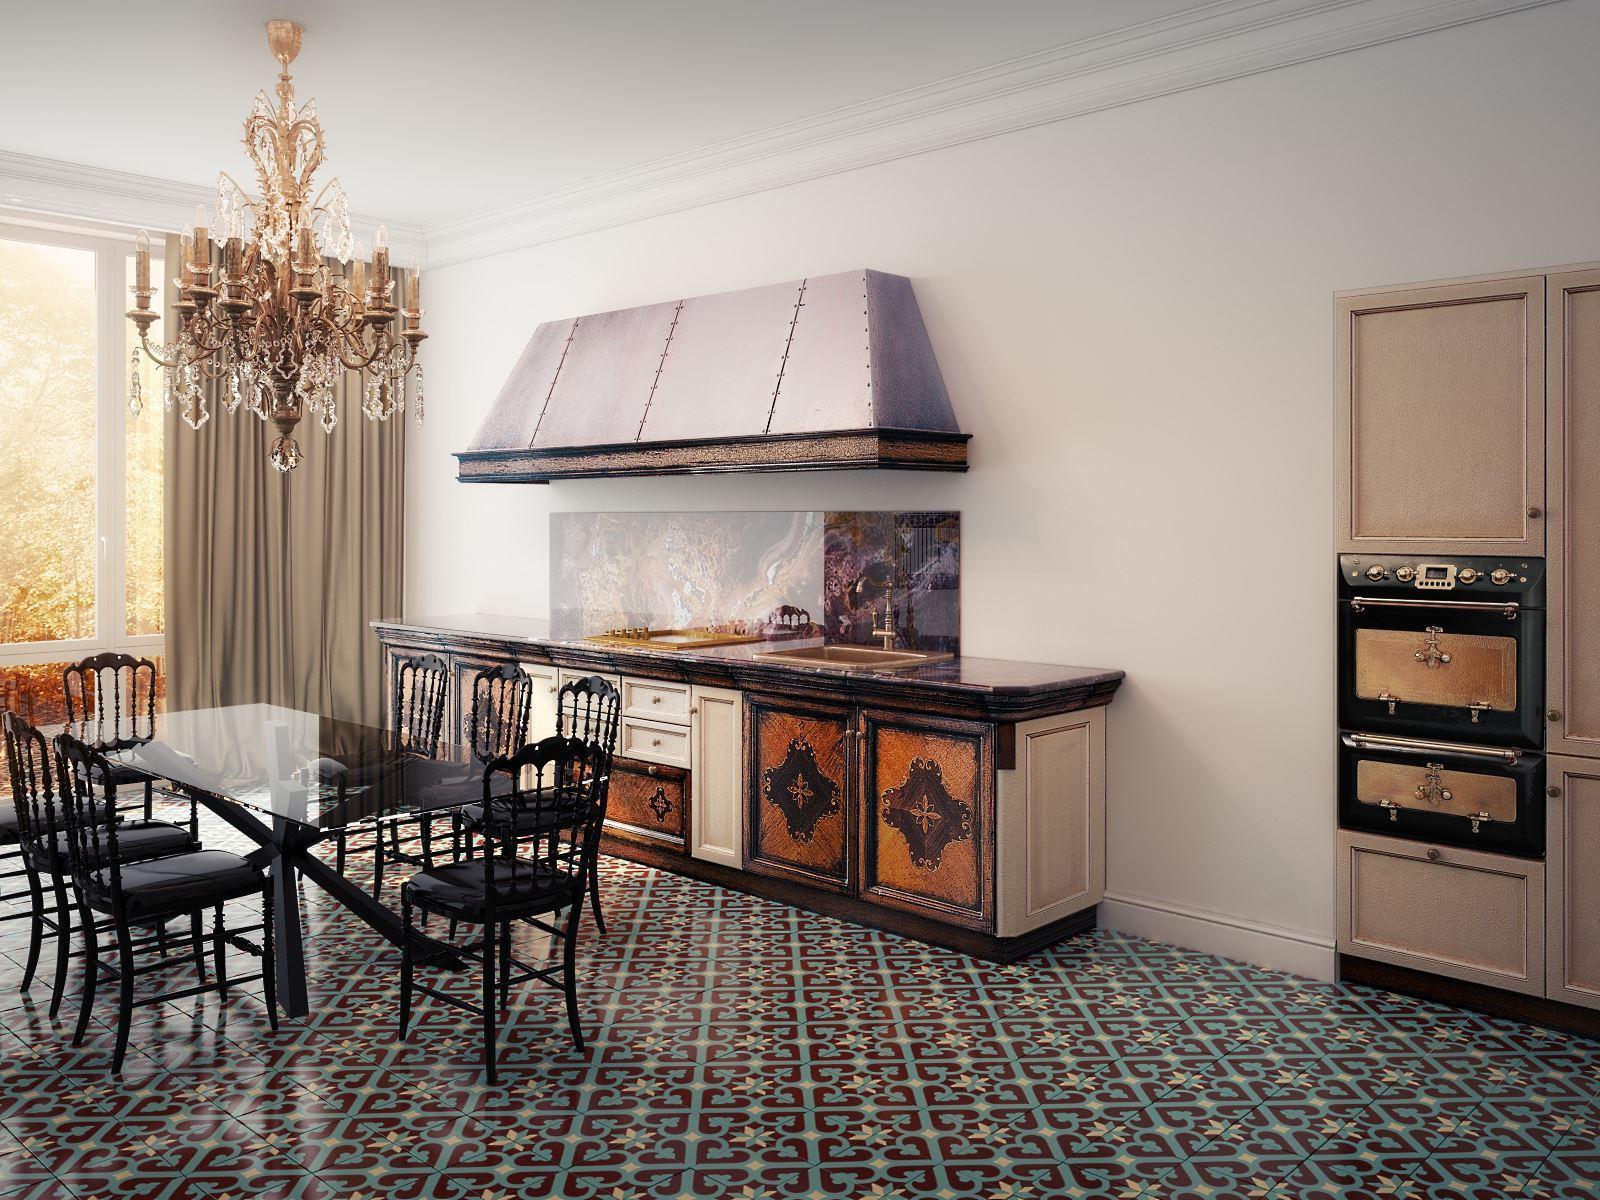 кухни в стиле эклектика фото ним нередко провоцировали